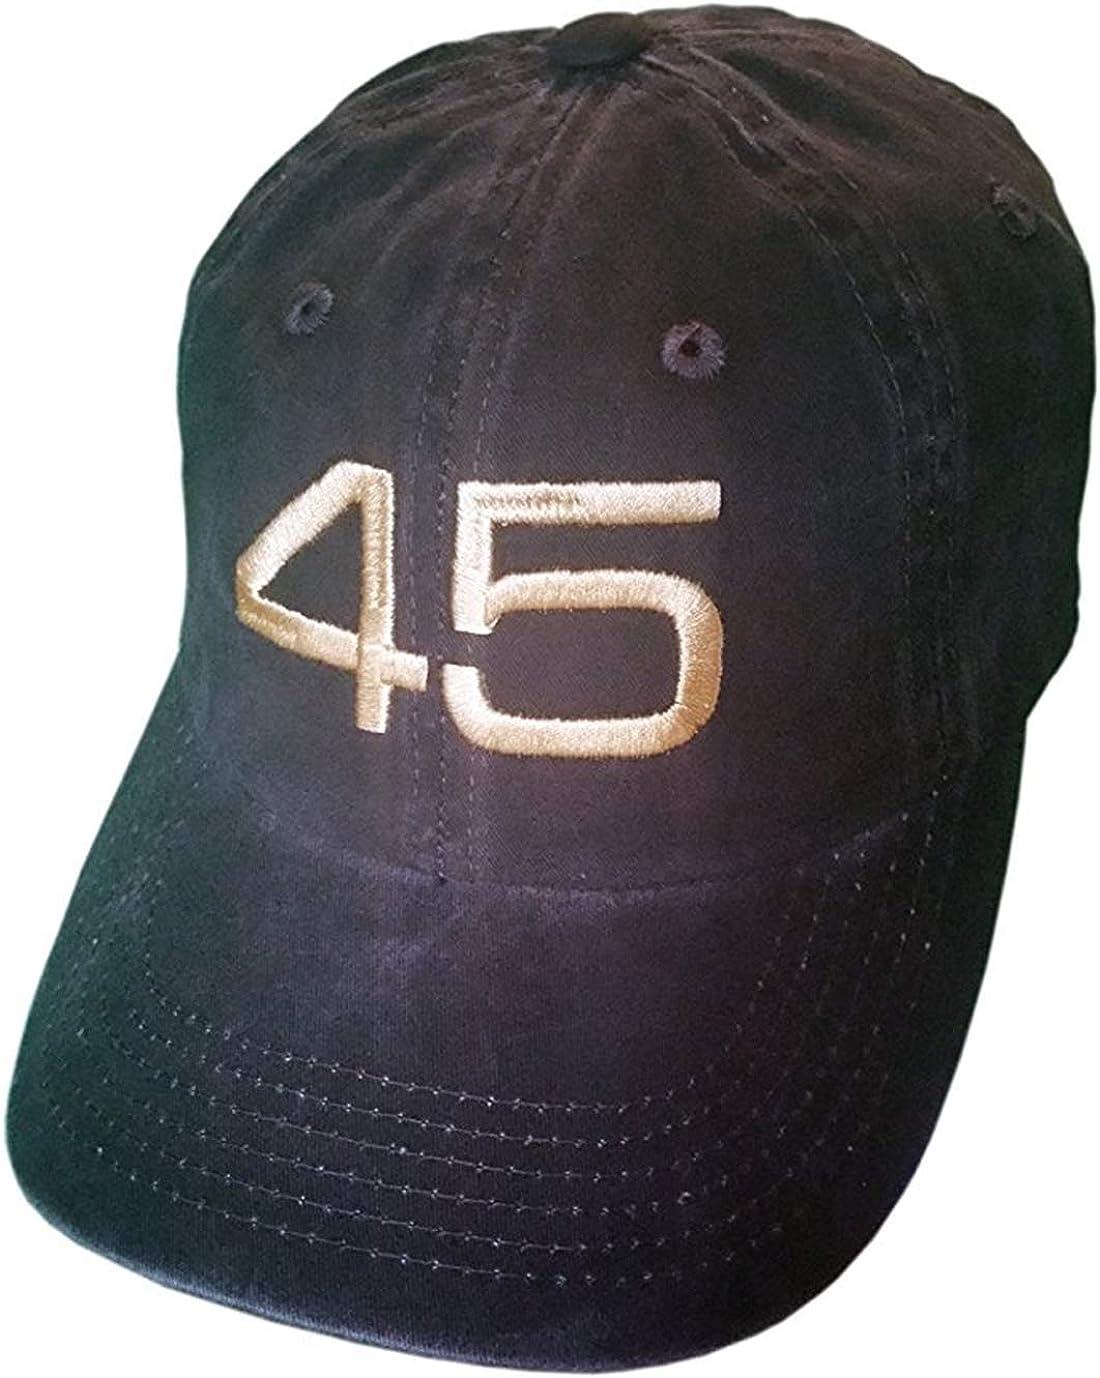 Treefrogg Apparel 45 Trump Hat - Trump 45 Hat - Trump Cap